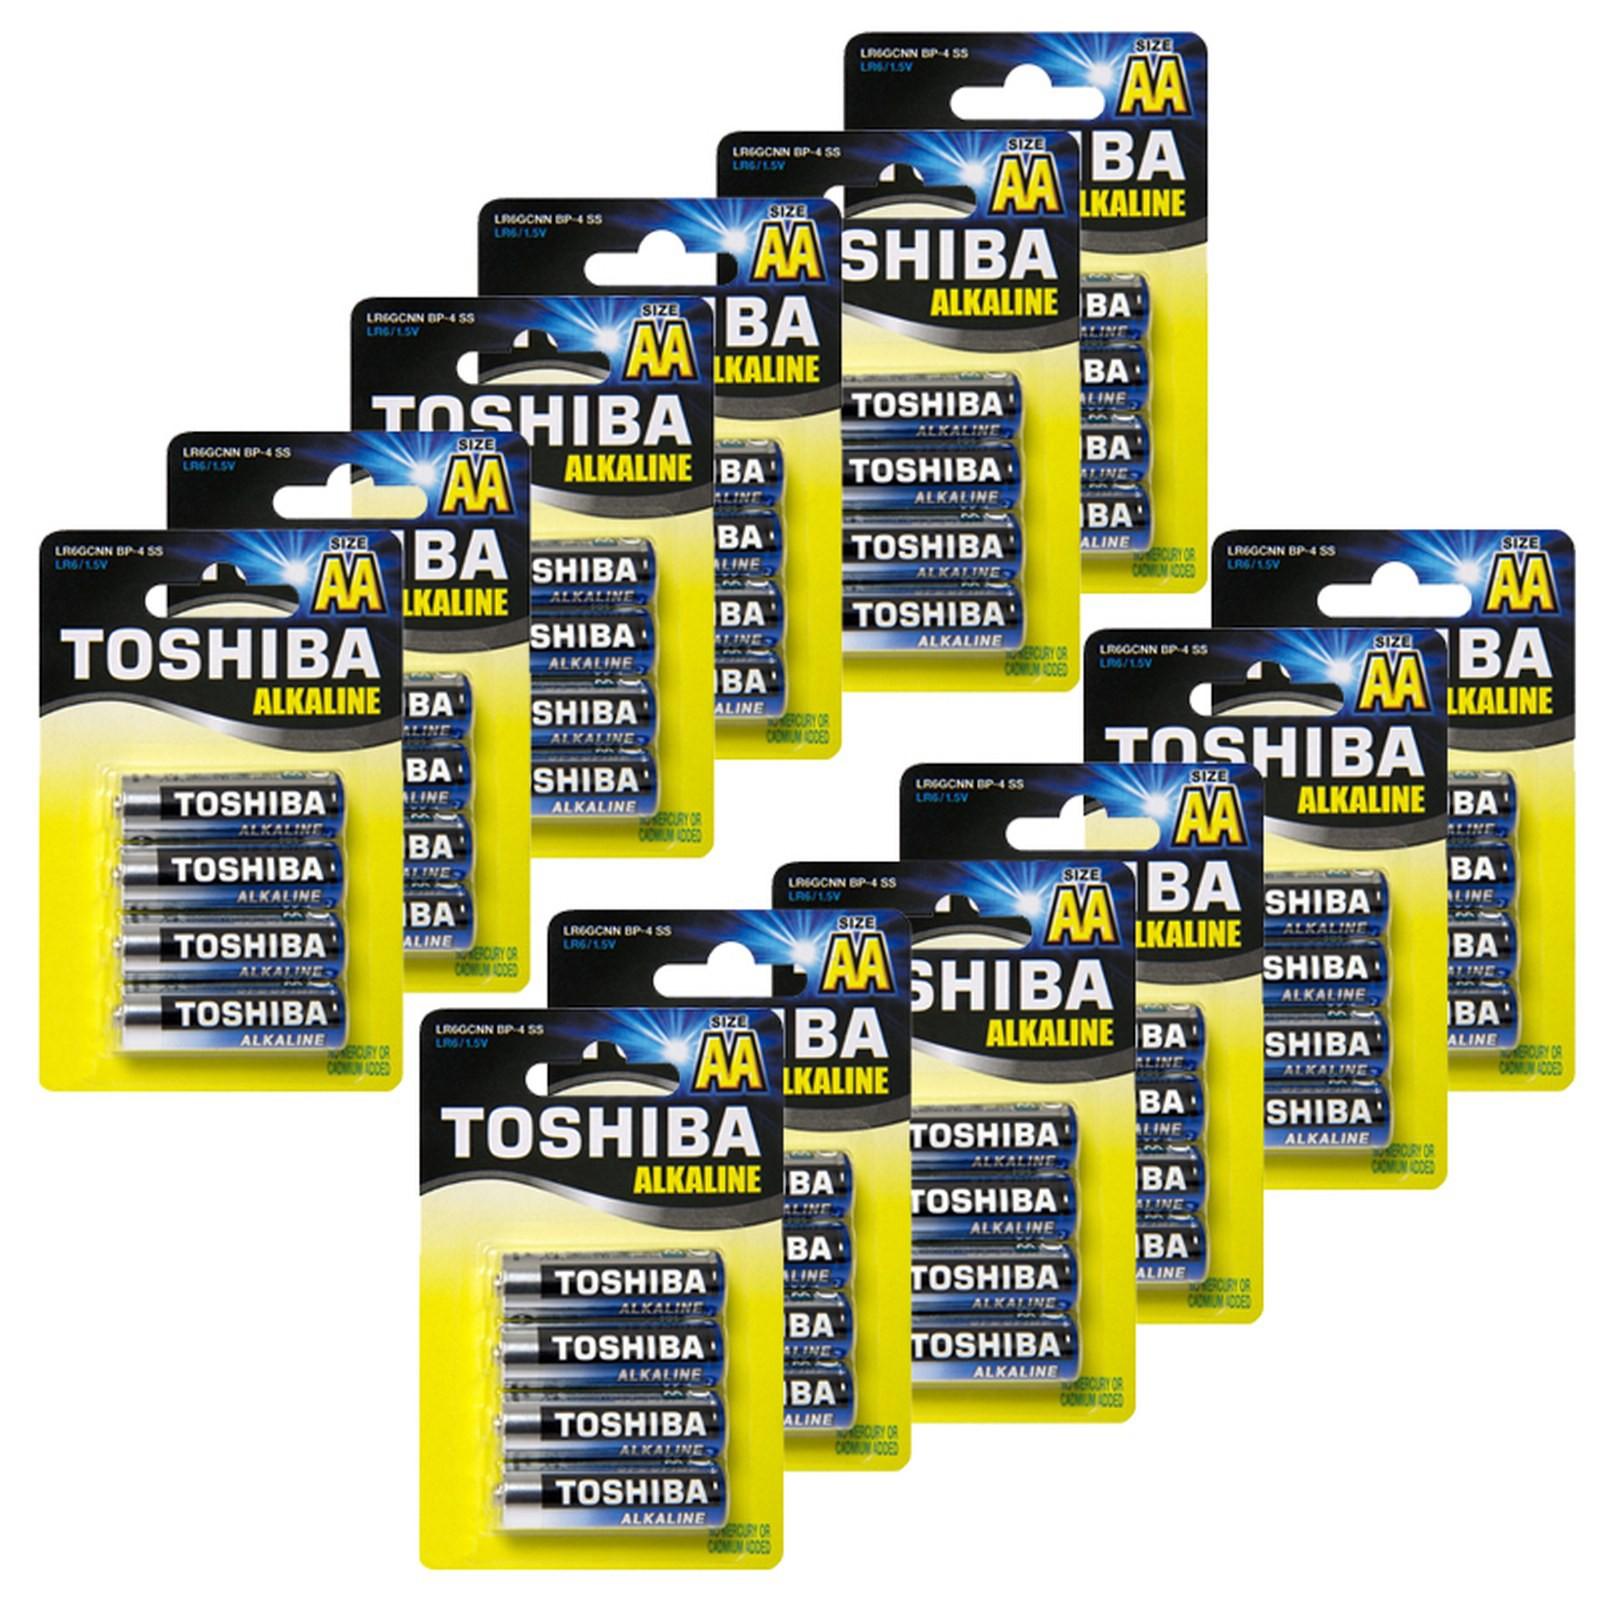 48 Batterie Pile STILO AA TOSHIBA Alkaline Alcaline Blue Line LR6 1.5V Batteria